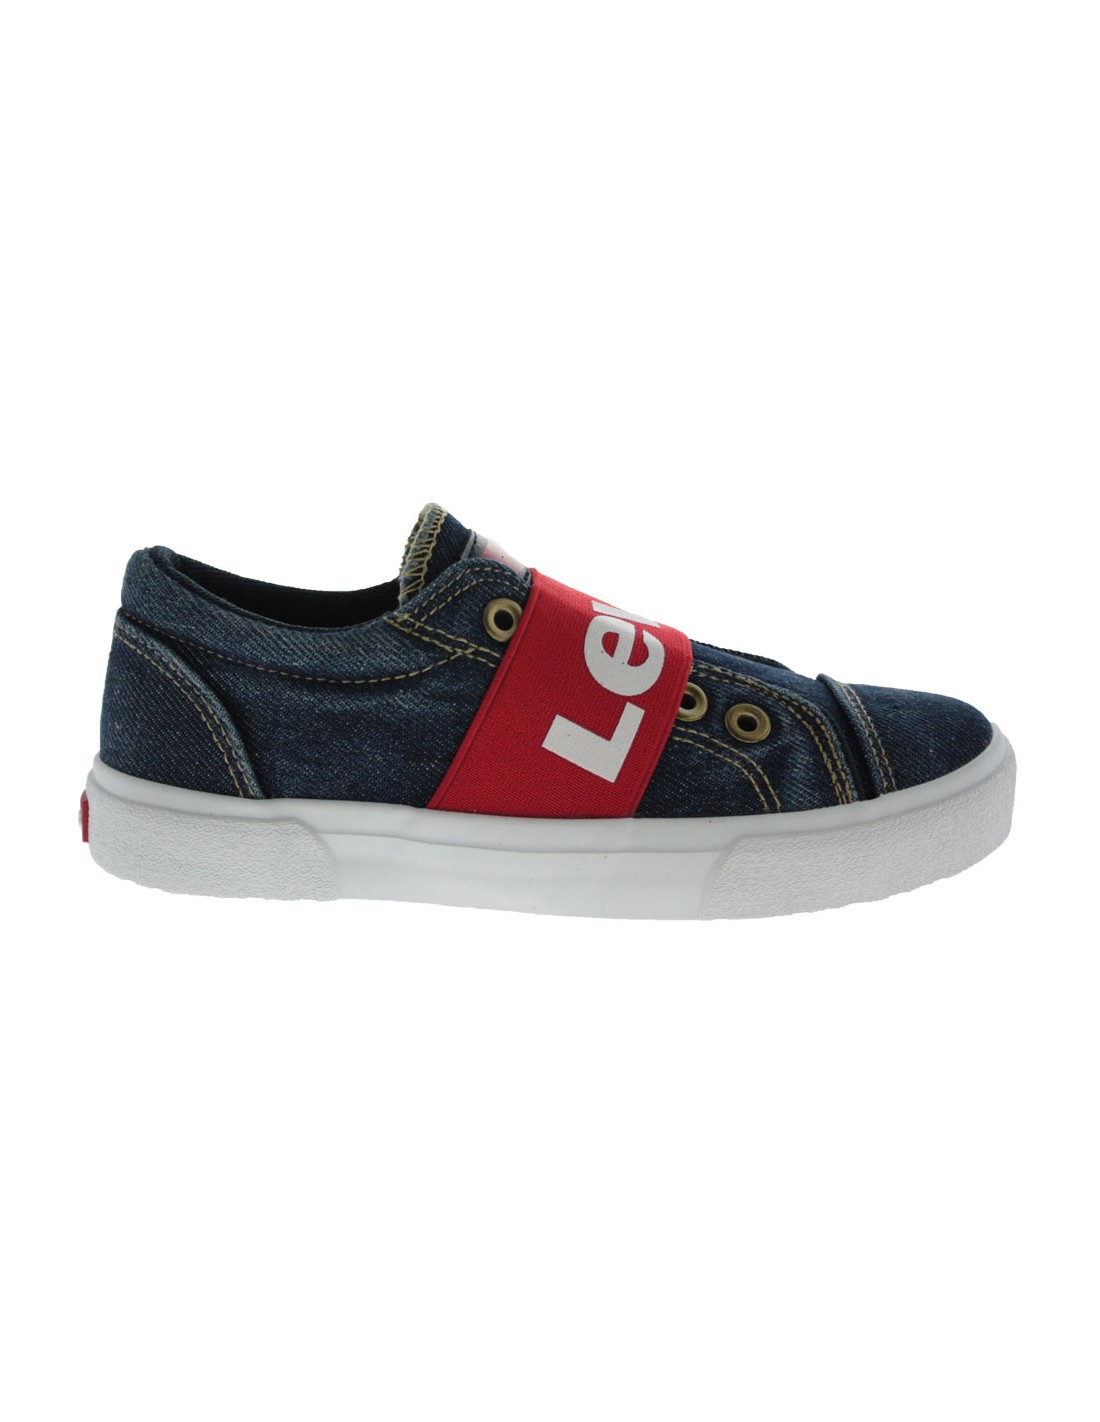 brand new 2eda4 23de9 Scarpe Levi's Bermuda Elastic bambino bambina jeans